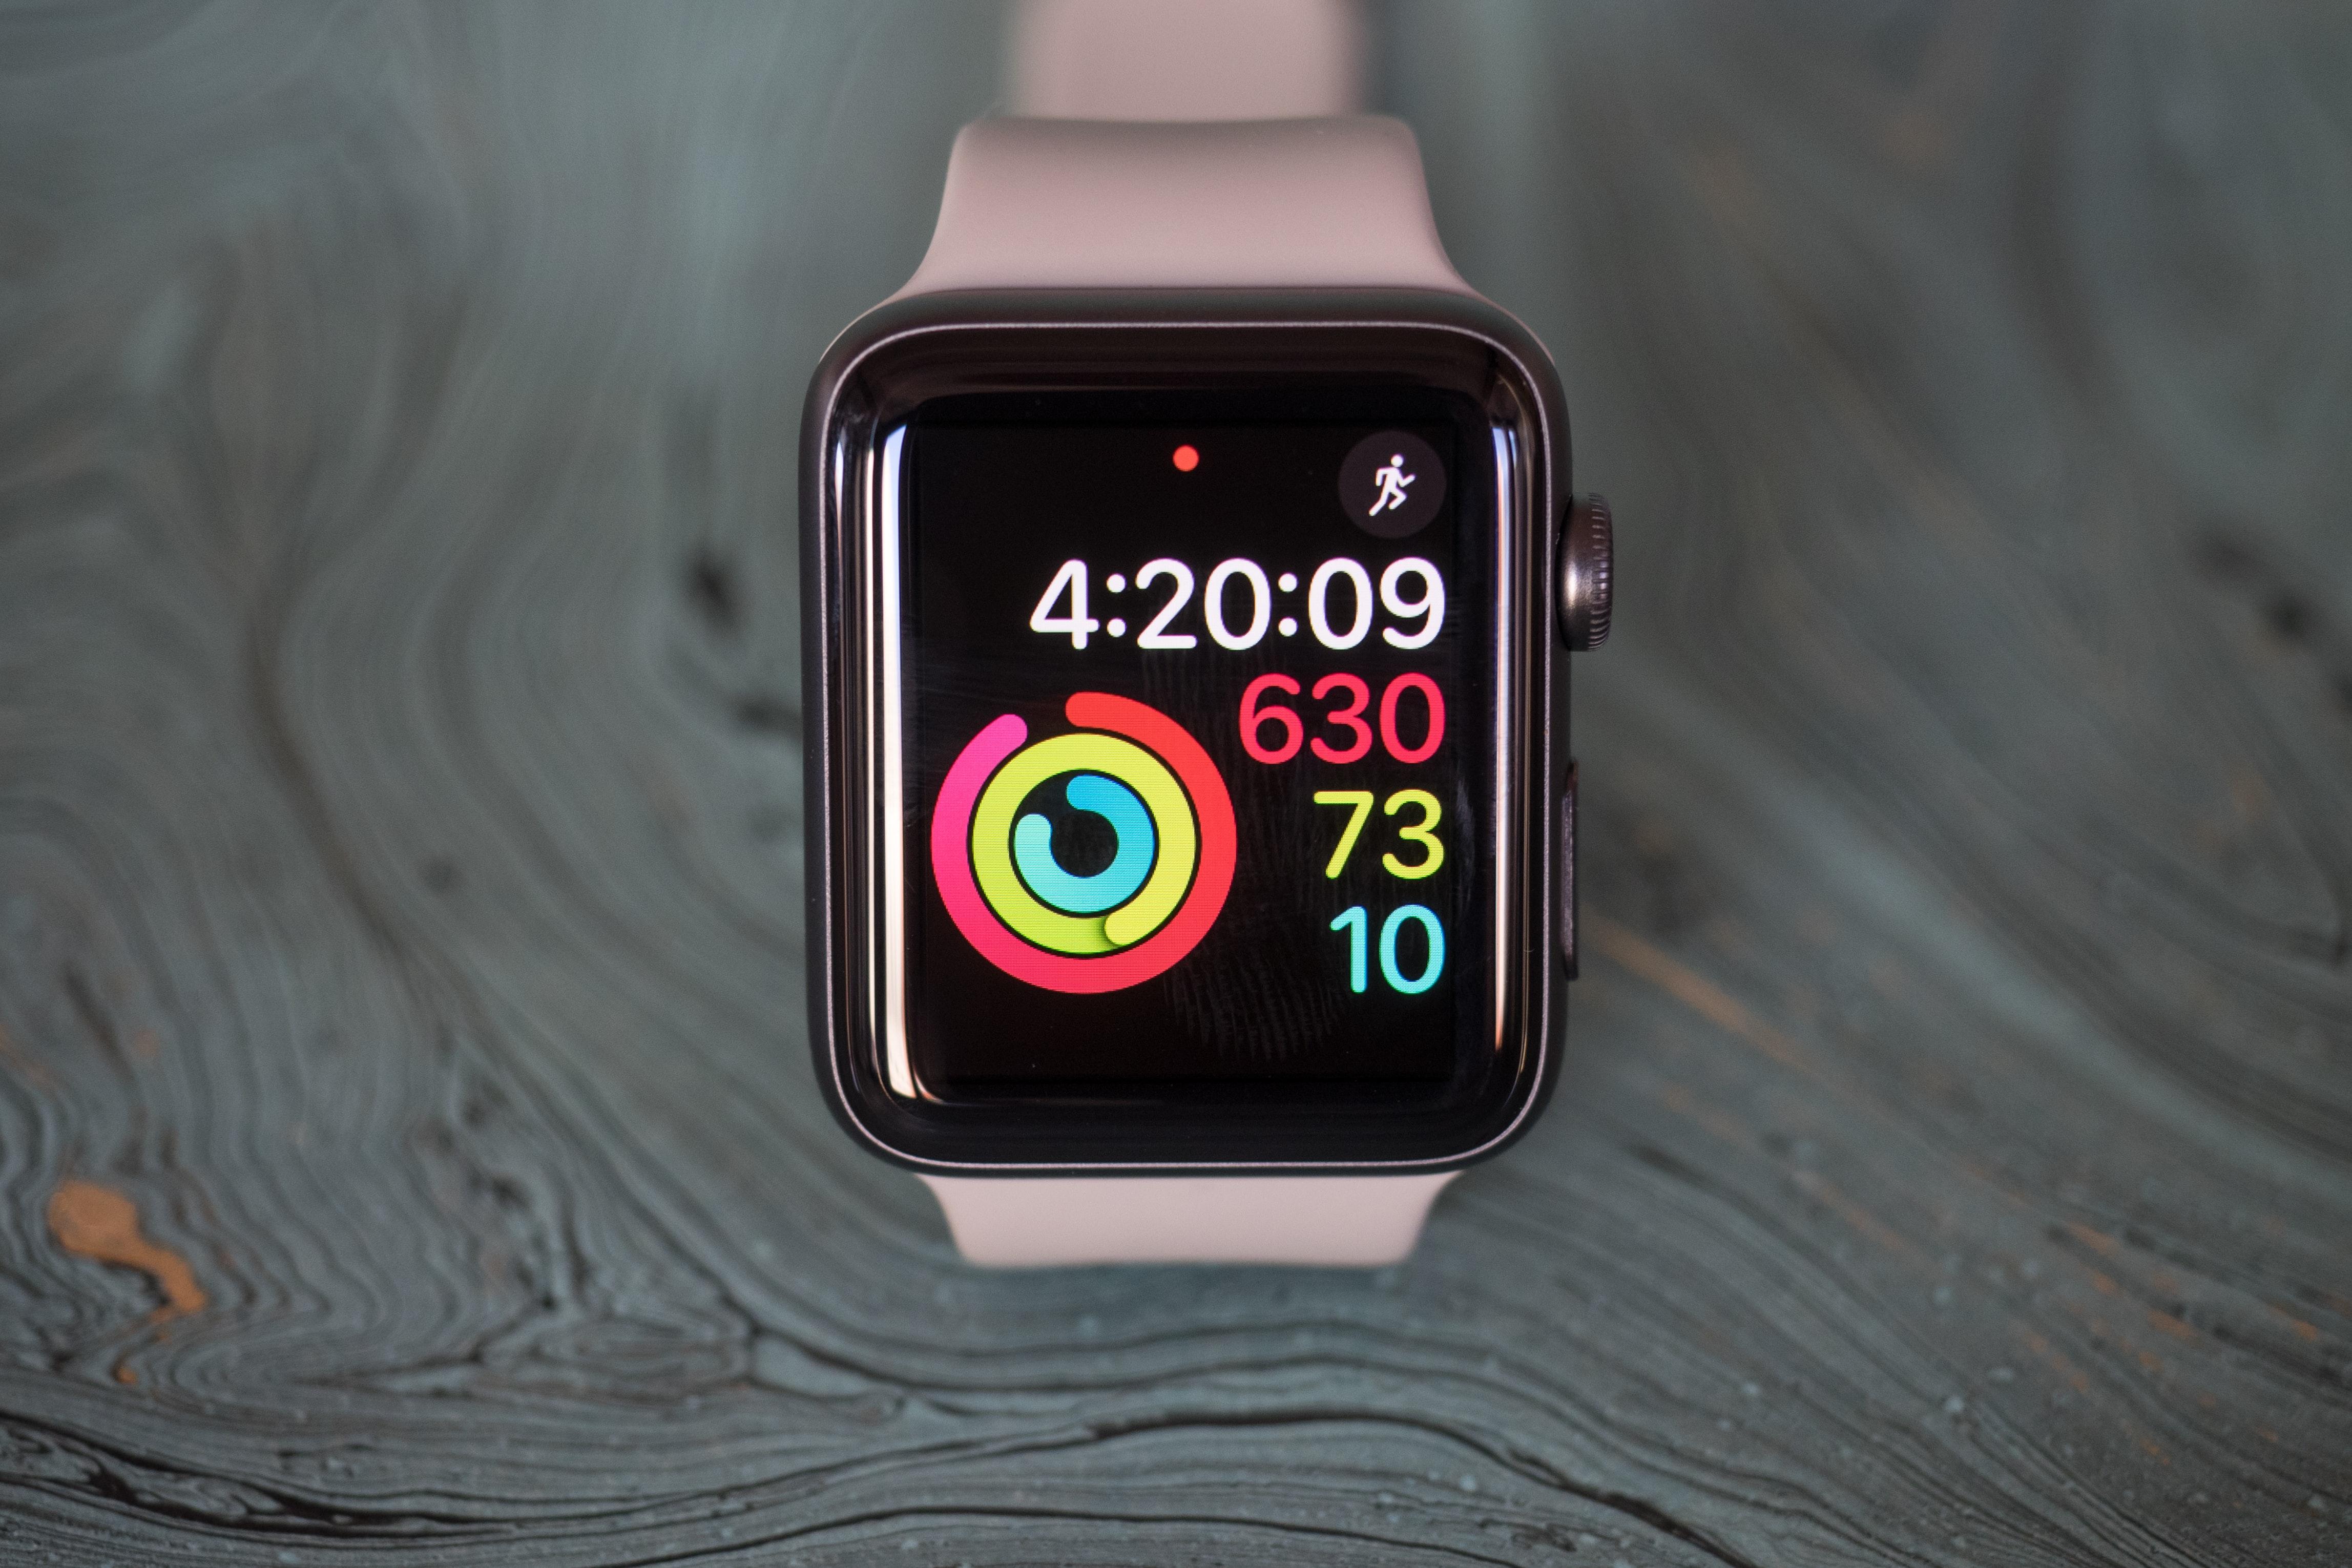 Pa101603.jpg?ixlib=rails 1.1 business news: forget the swiss, it's fossil that apple is threatening Business News: Forget the Swiss, It's Fossil That Apple Is Threatening PA101603